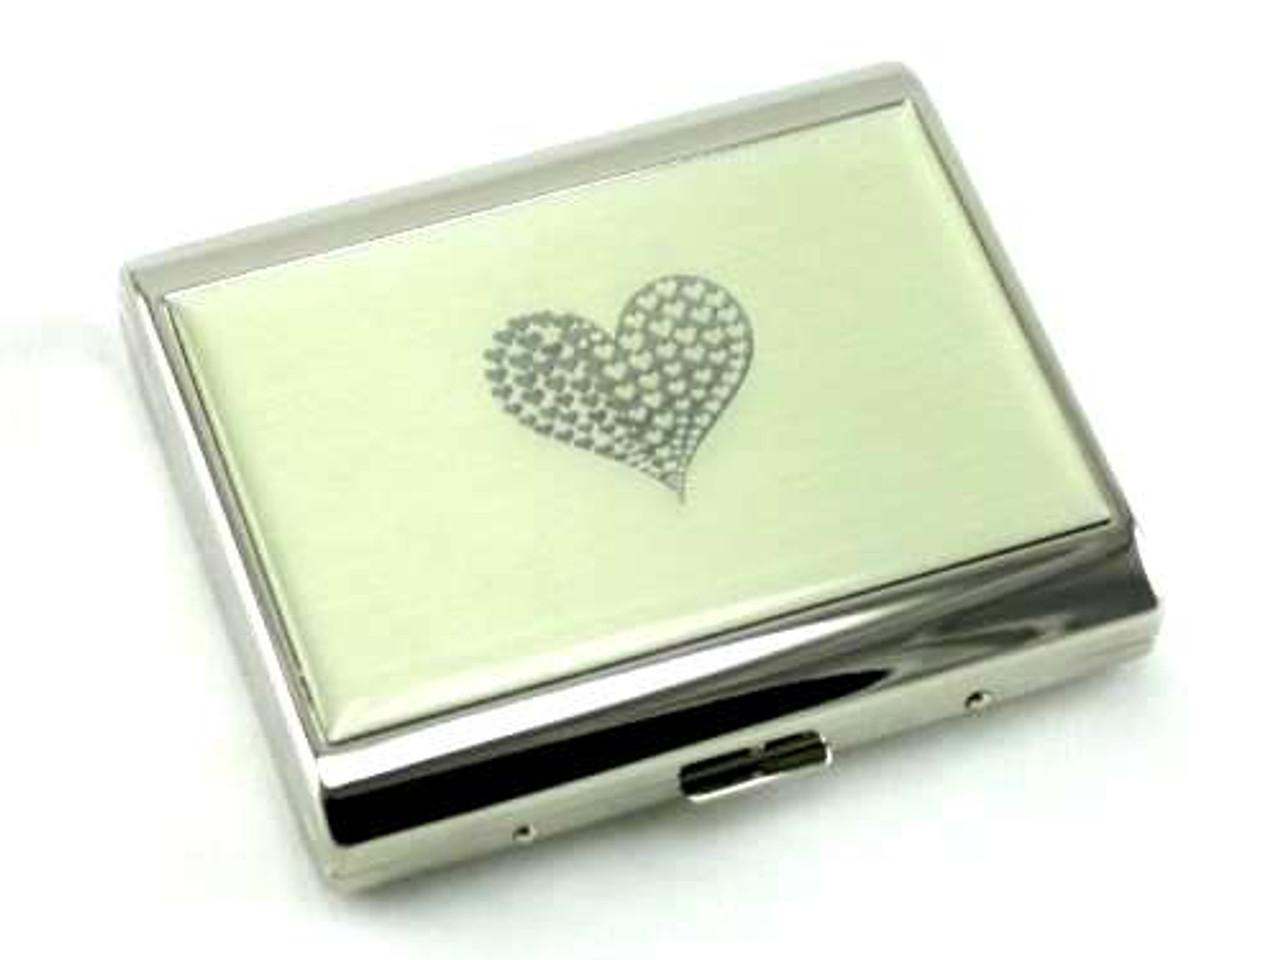 Lucienne Flying Hearts Cigarette Case